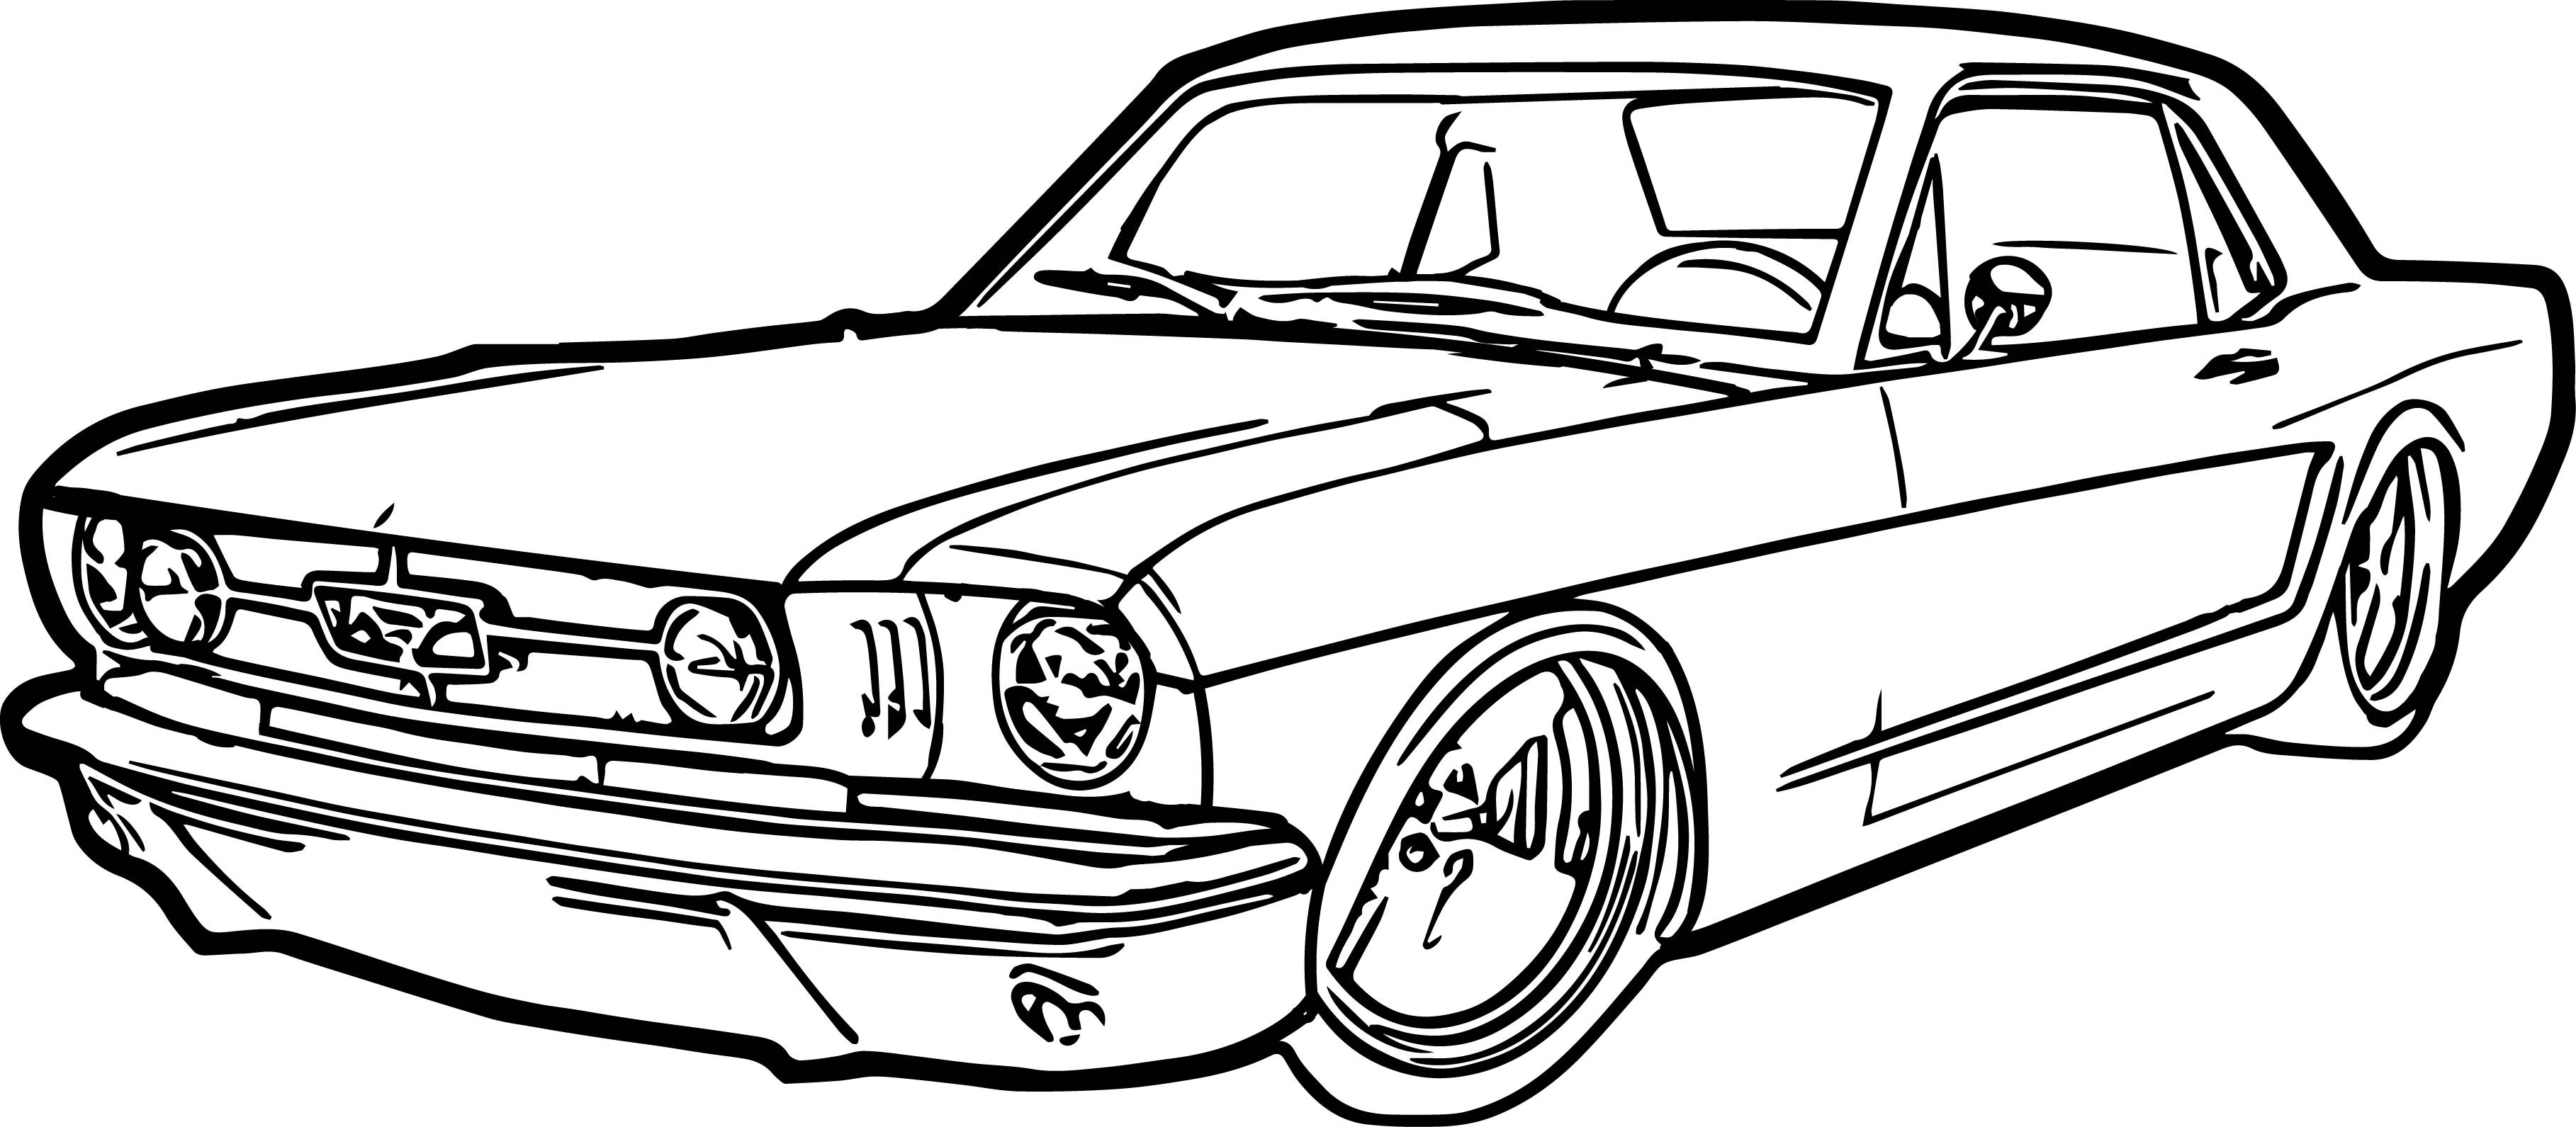 3635x1591 cool car coloring page new super car chevrolet camaro coloring